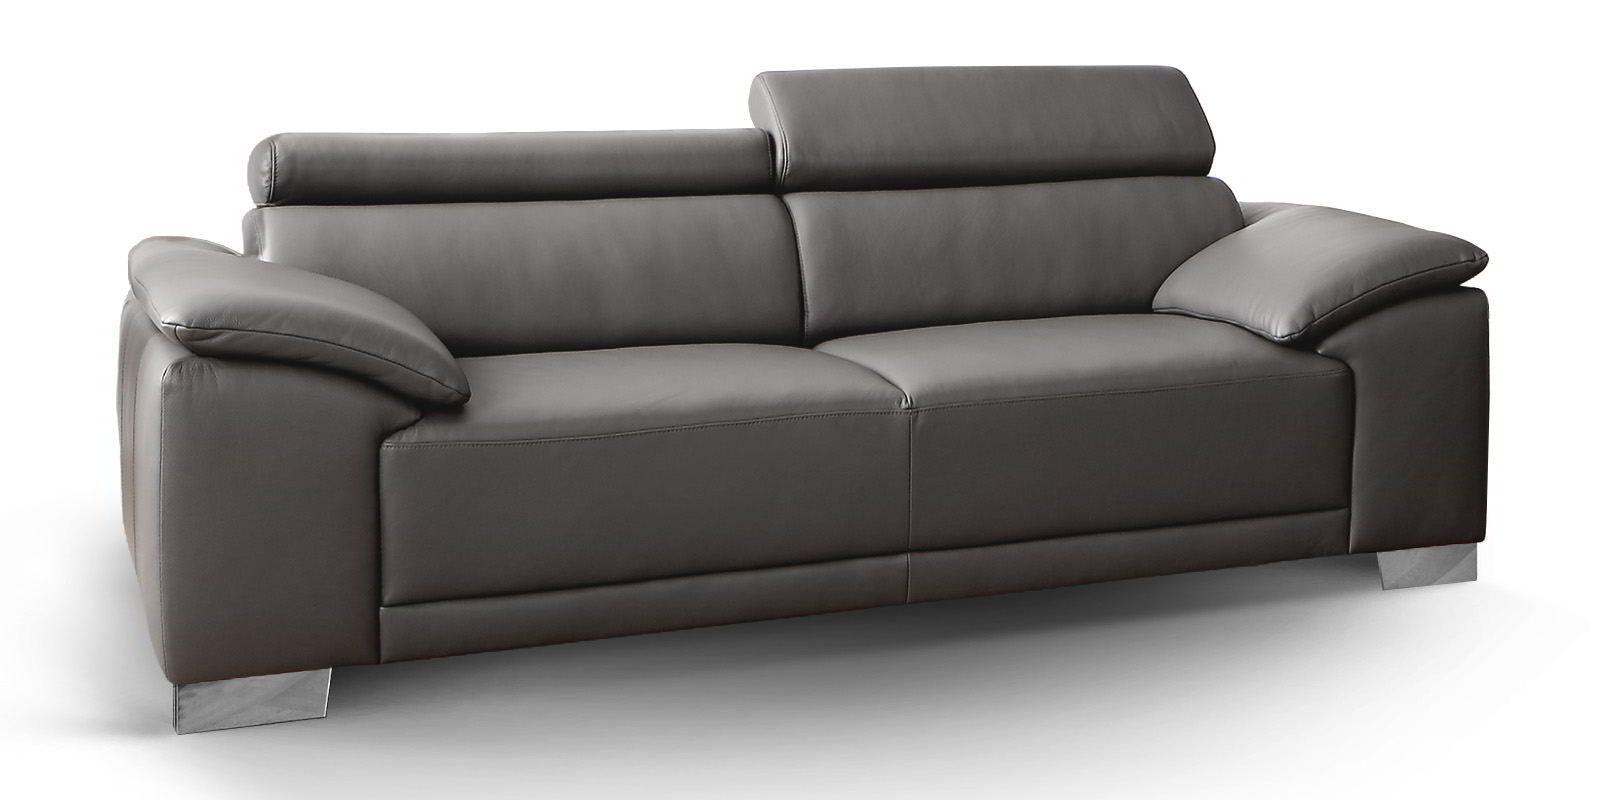 Full Size of Sofa 3 2 1 Sitzer Couchgarnitur 3 2 1 Sitzer Chesterfield Emma Samt Superior Big Emma Sofas Candy Amalfi 3c Couch Grand Polyrattan Hersteller Bett 160x200 Mit Sofa Sofa 3 2 1 Sitzer